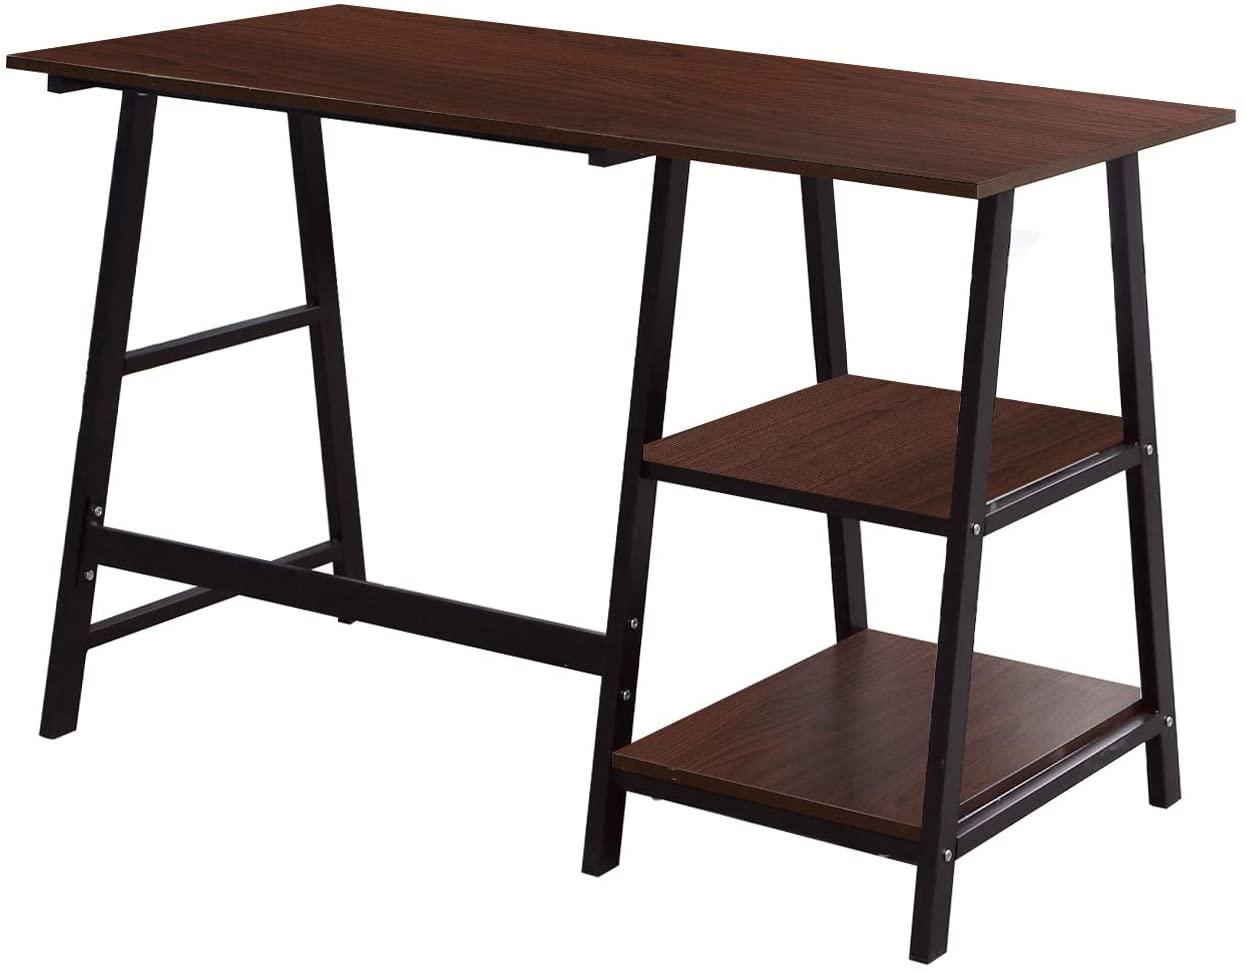 Soges 55 Inch Computer Desk Trestle Desk Writing Home Office Desk Hutch Workstation with Shelf,Walnut & Black CS-Tplus-140WB